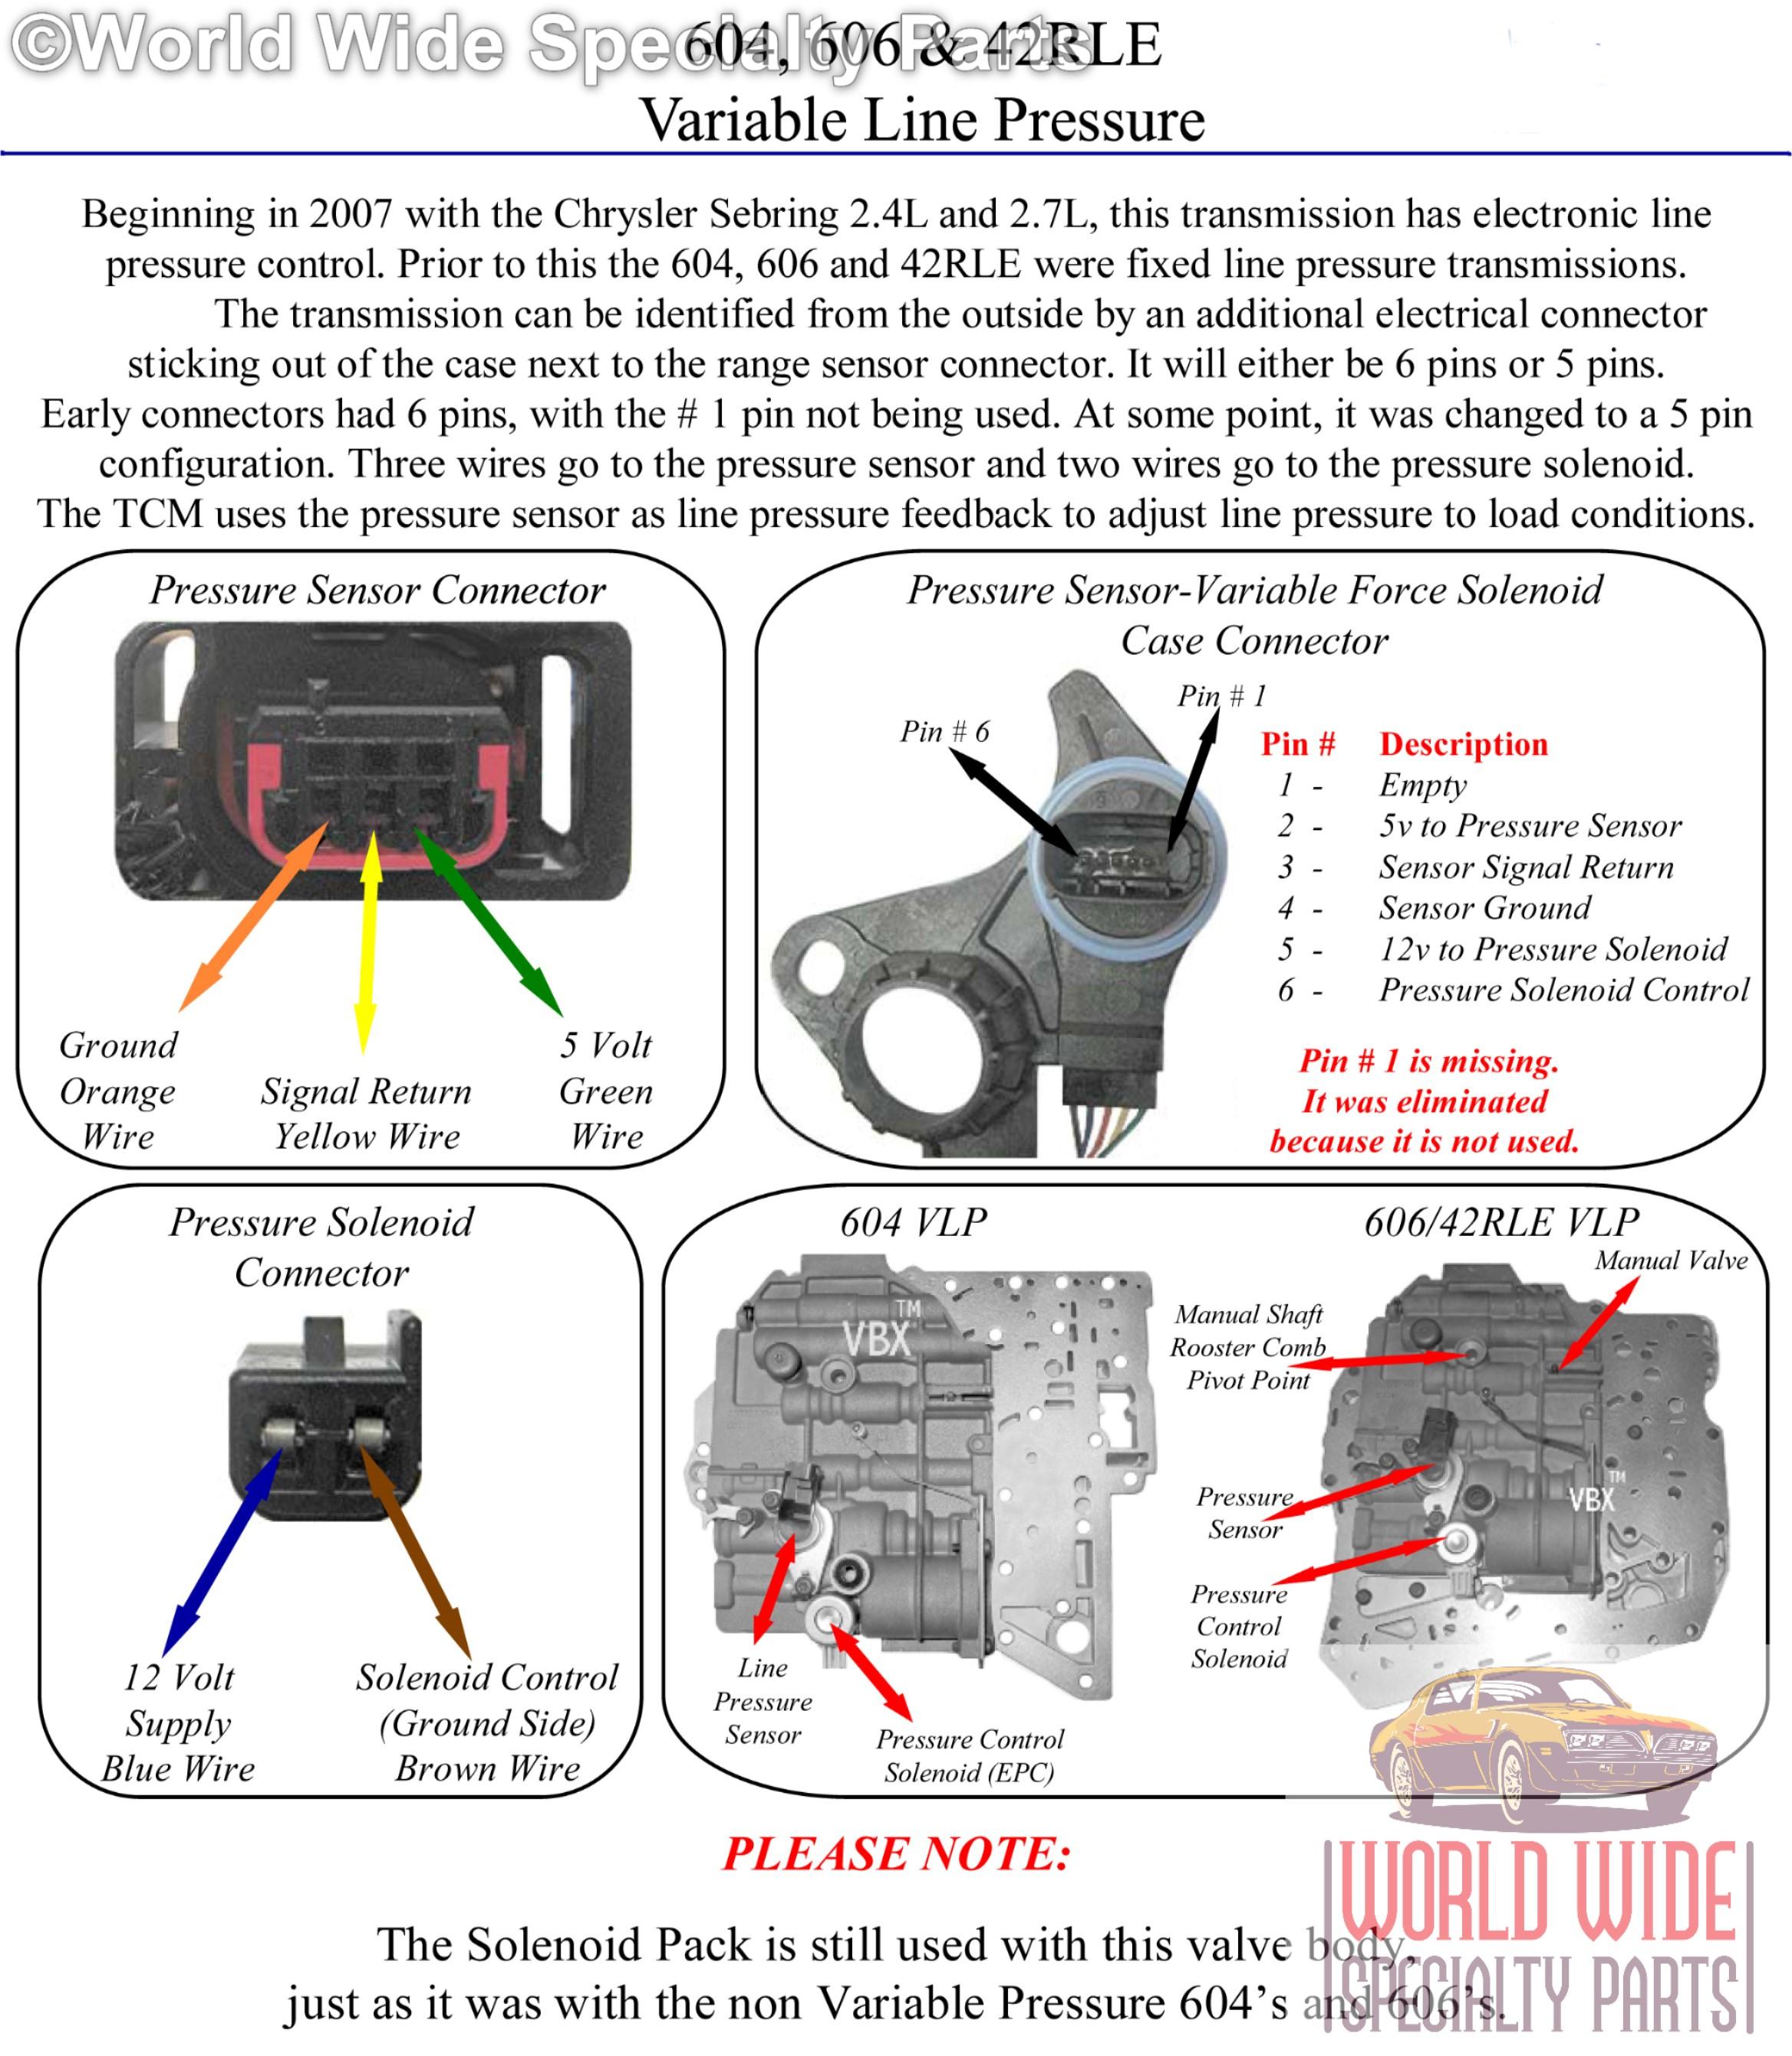 [SCHEMATICS_4PO]  LF_1560] A606 42Le Transmission Wiring Diagram Free Diagram | A606 42le Transmission Wiring Diagram |  | Ginia Mepta Mohammedshrine Librar Wiring 101